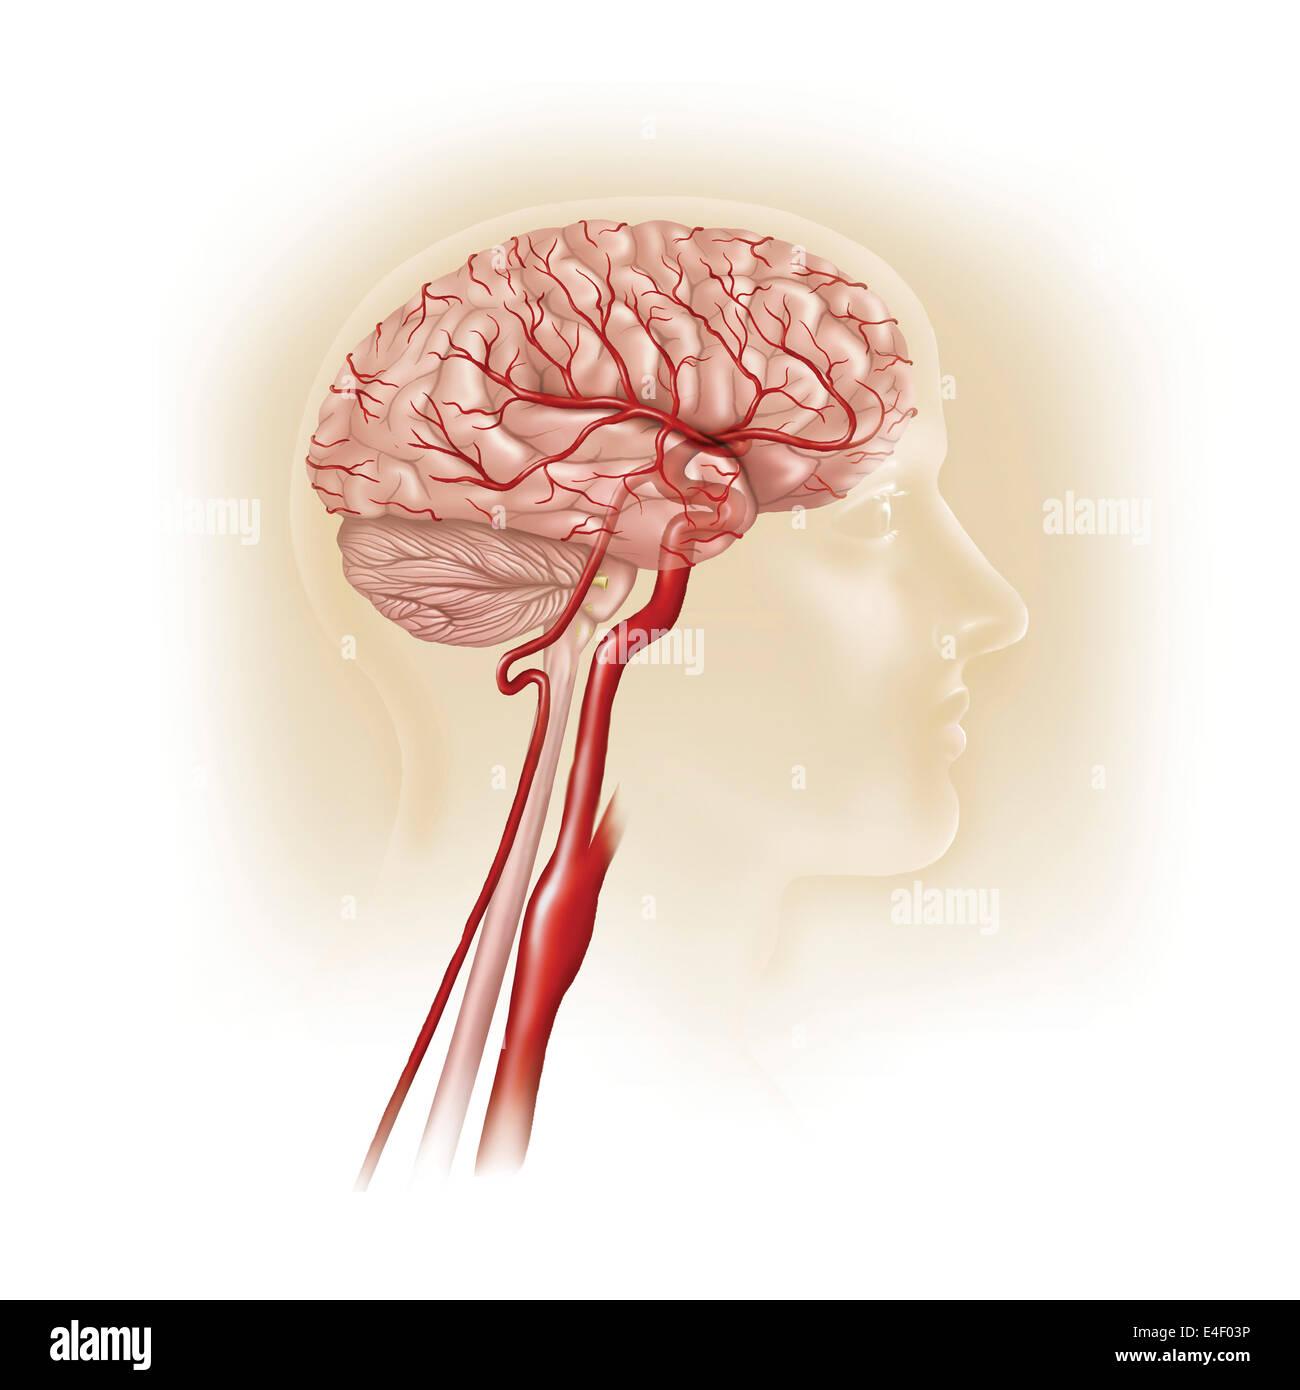 Carotid Artery Stockfotos & Carotid Artery Bilder - Alamy